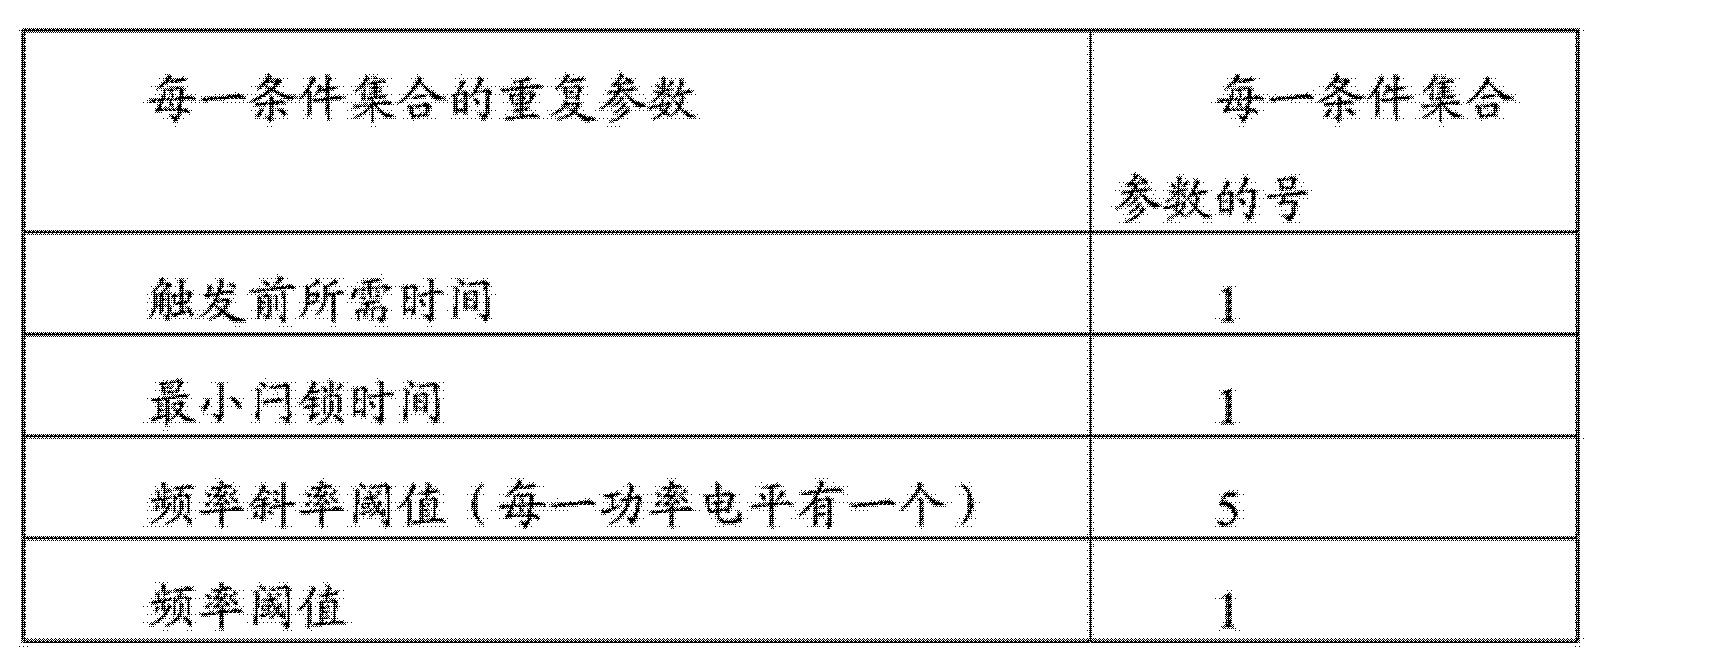 Figure CN104363844AD00451